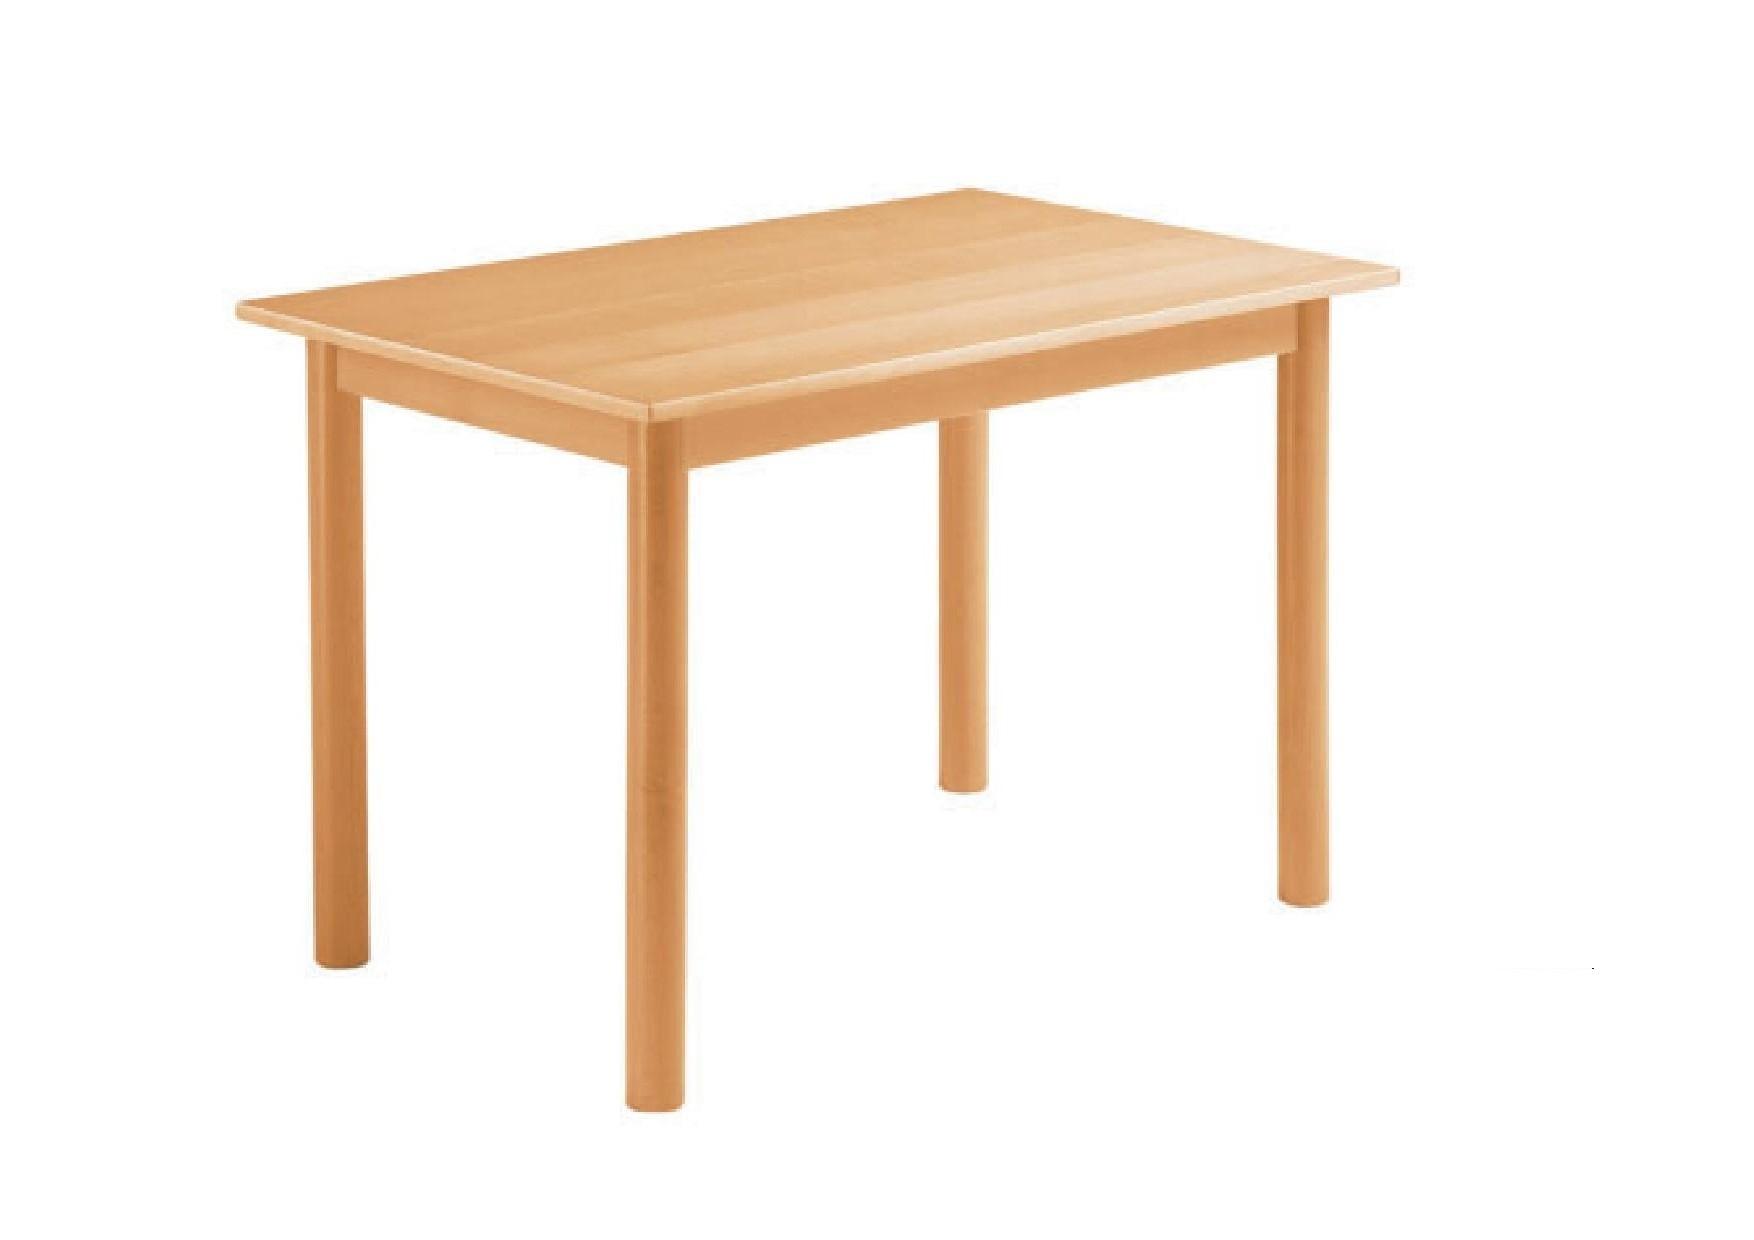 Tischgestell Holger 120x80 - Buchenholz